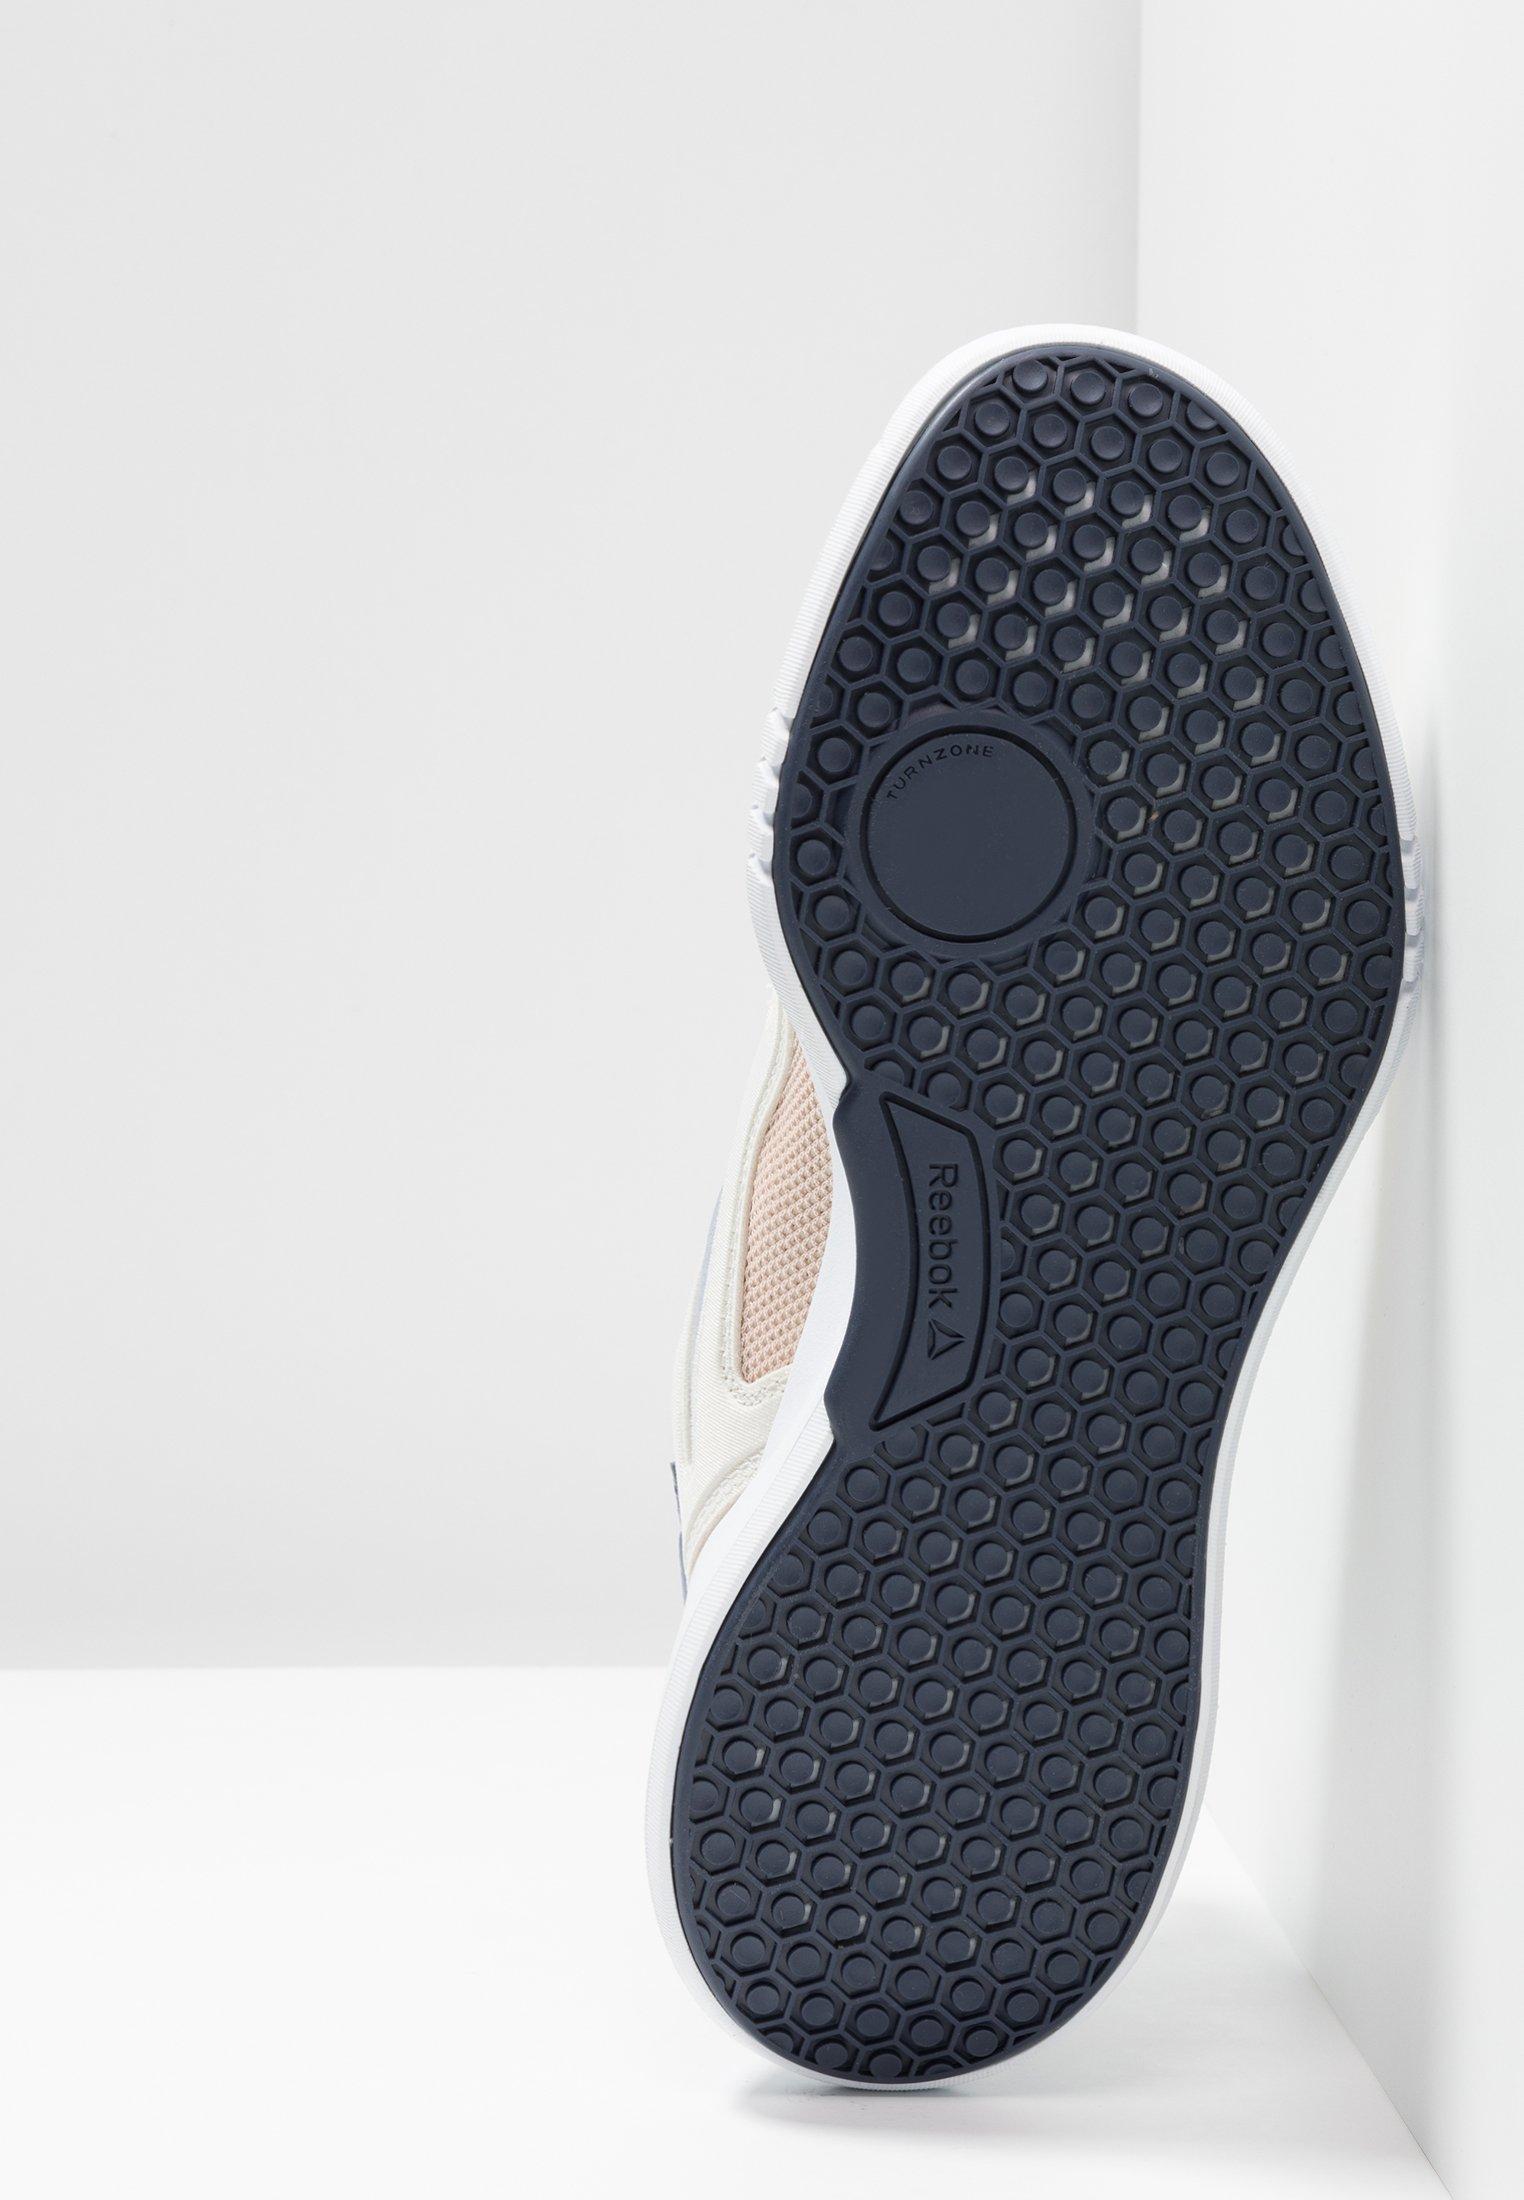 Reebok Freestyle Running Alabaster MotionScarpe Neutre denimdust 0OwP8nk